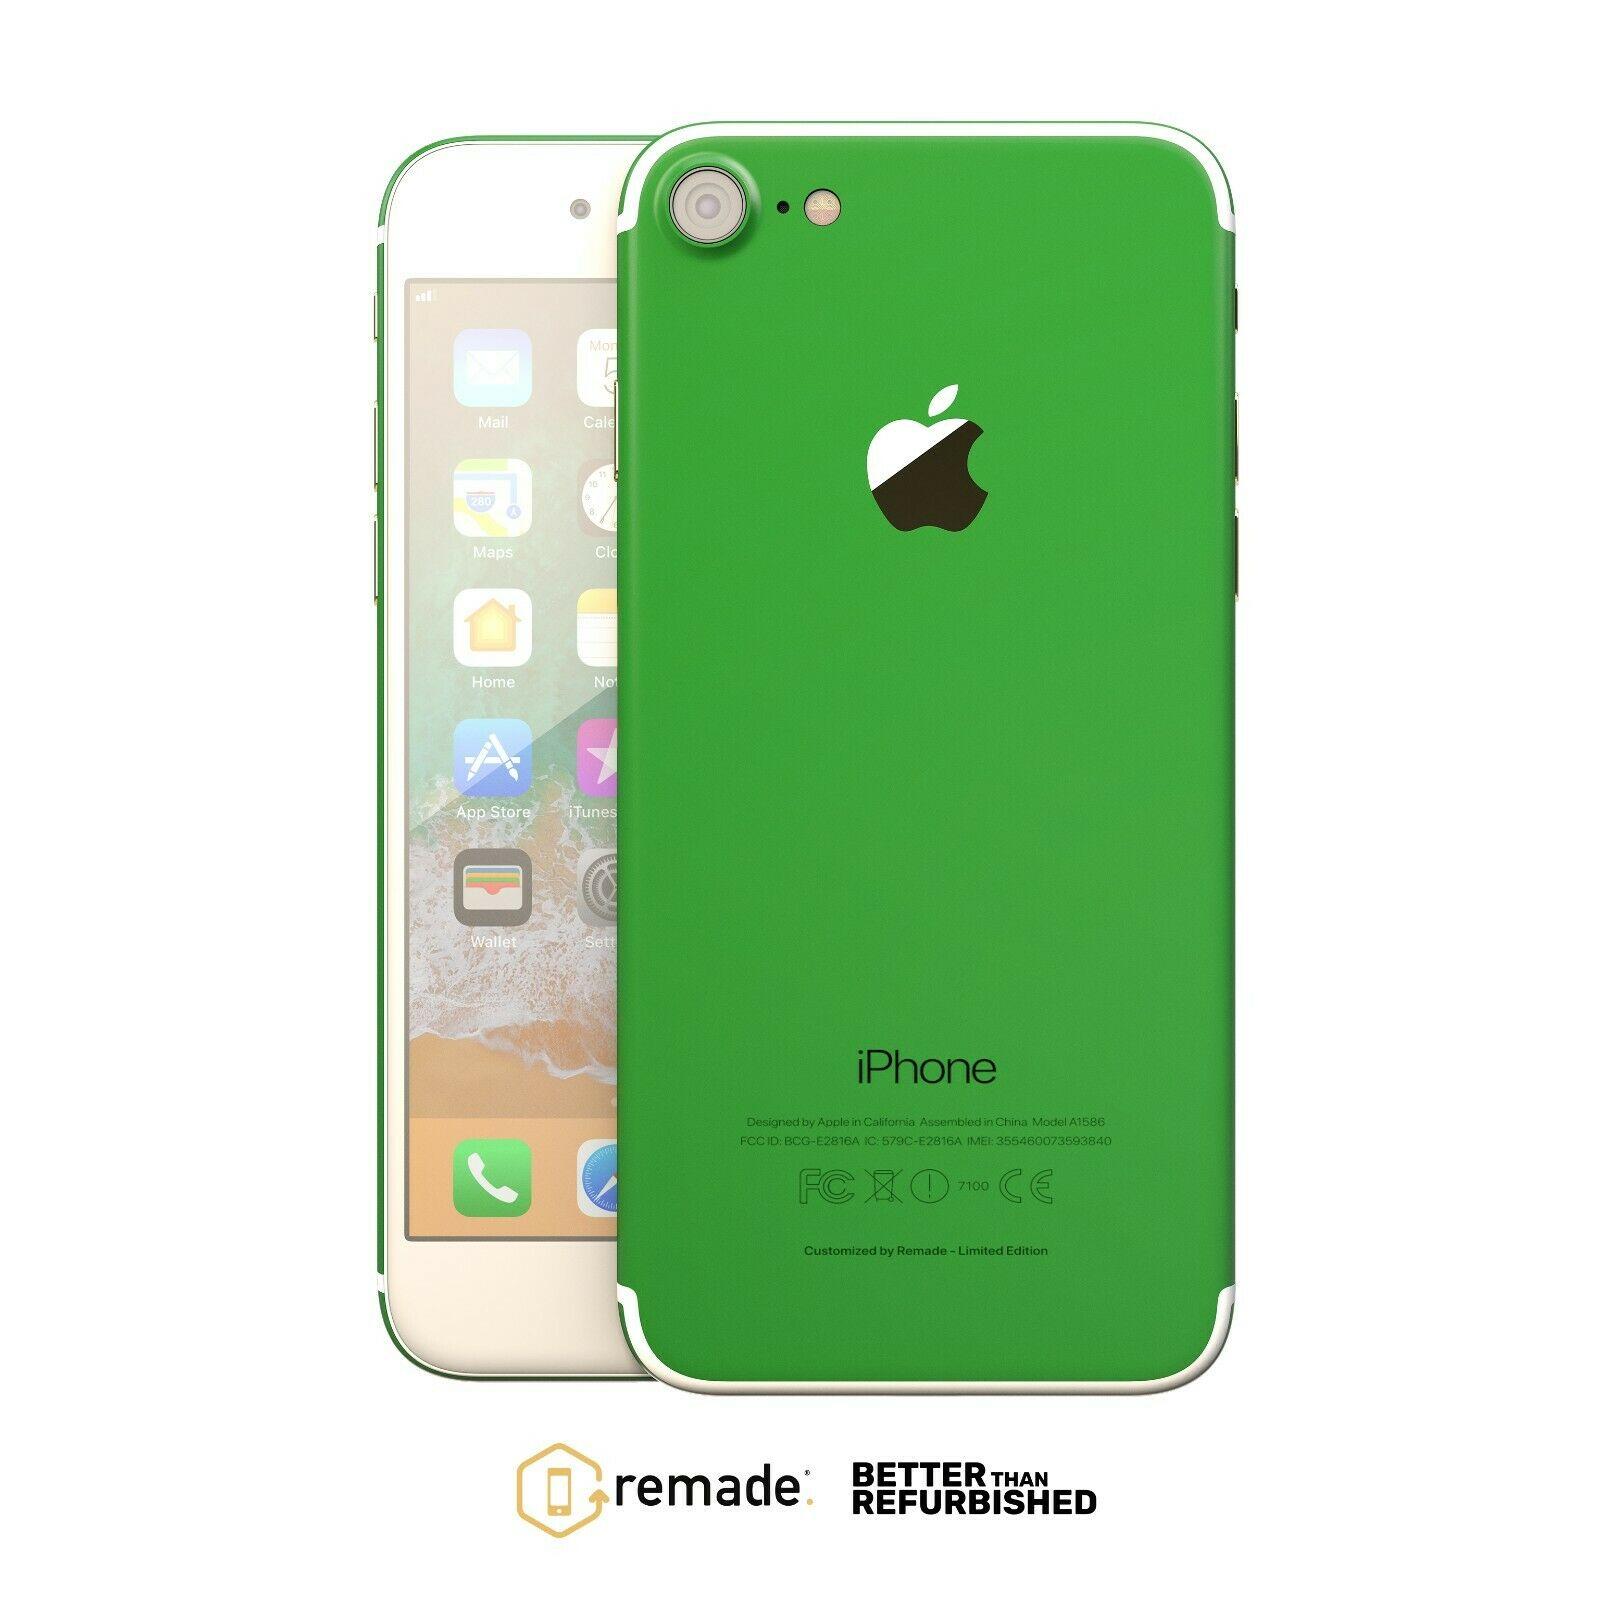 Apple iPhone 7 128GB Unlocked Smartphone in Remade Amazon Moss Colour 12 Months Warranty £152.99 @ StockMustGo / eBay